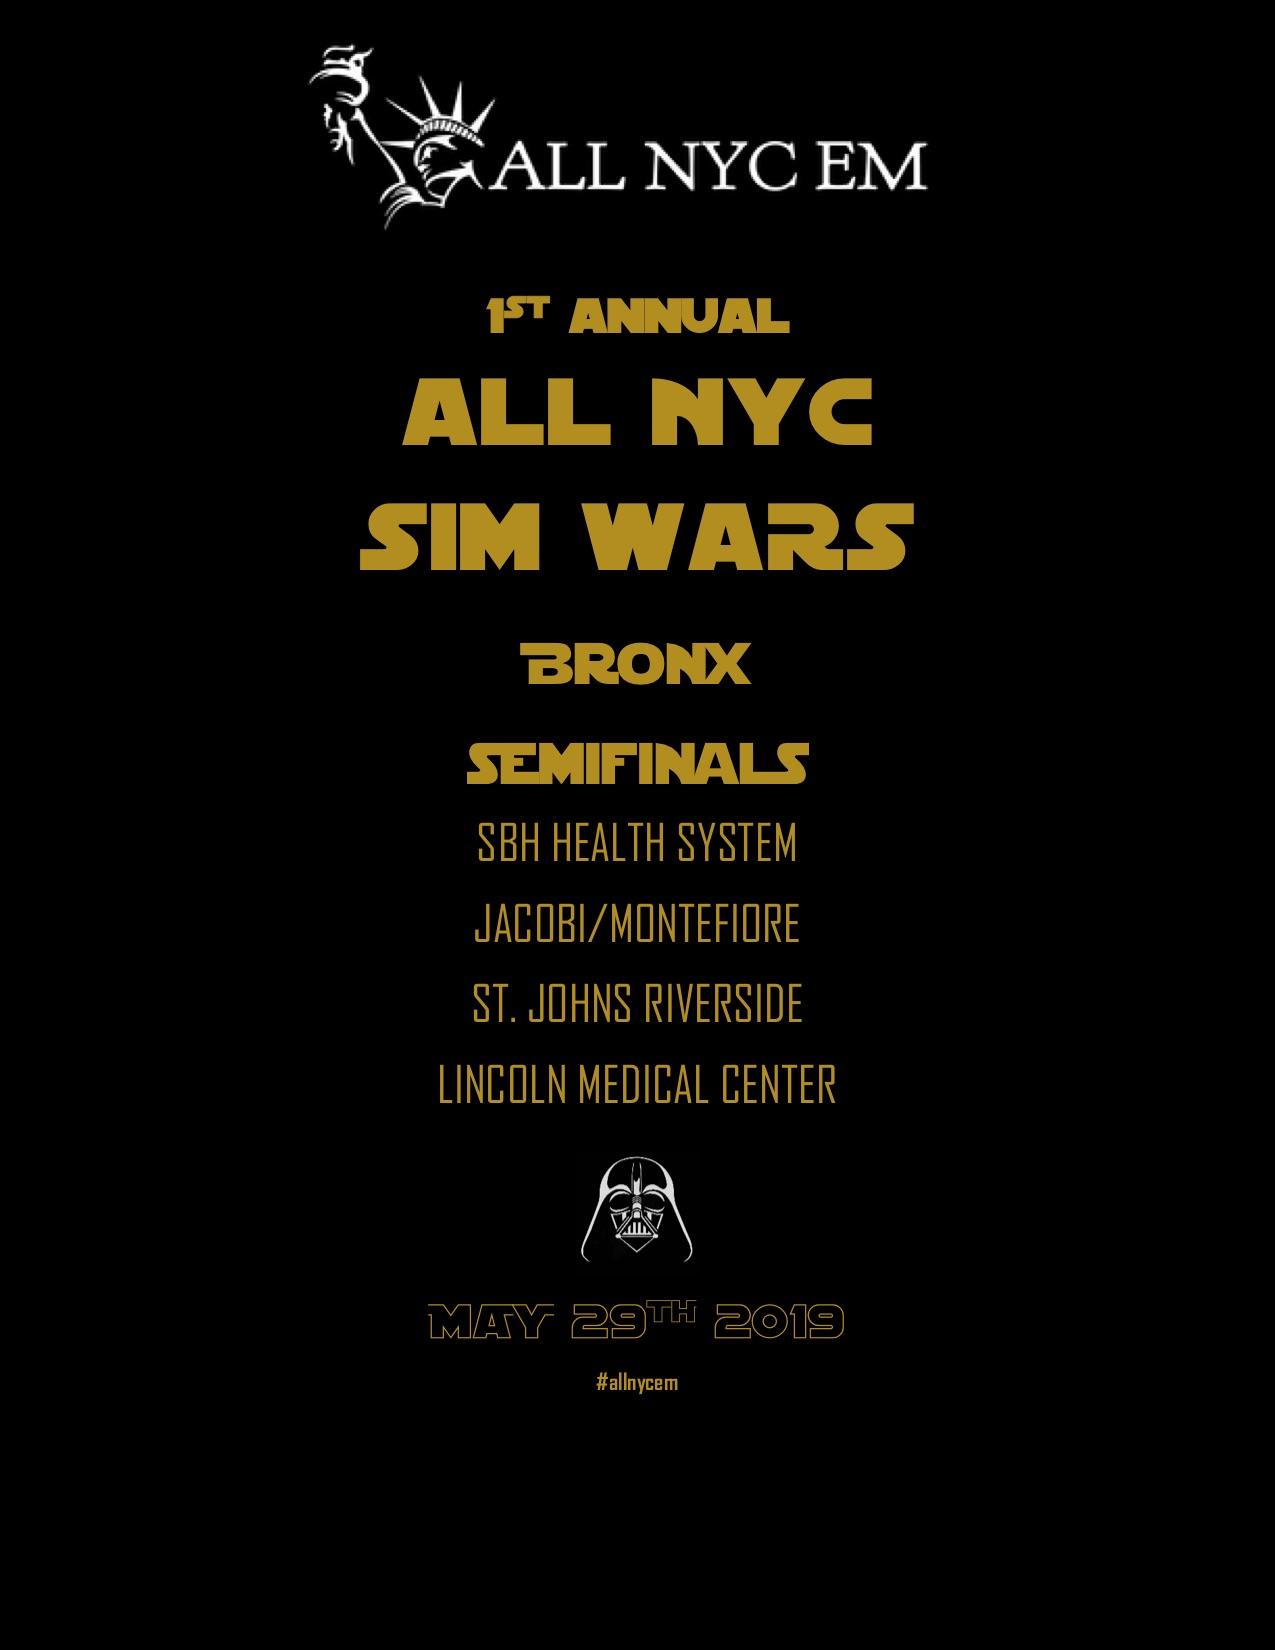 SIMWARS POSTER Bronx Draft.jpg